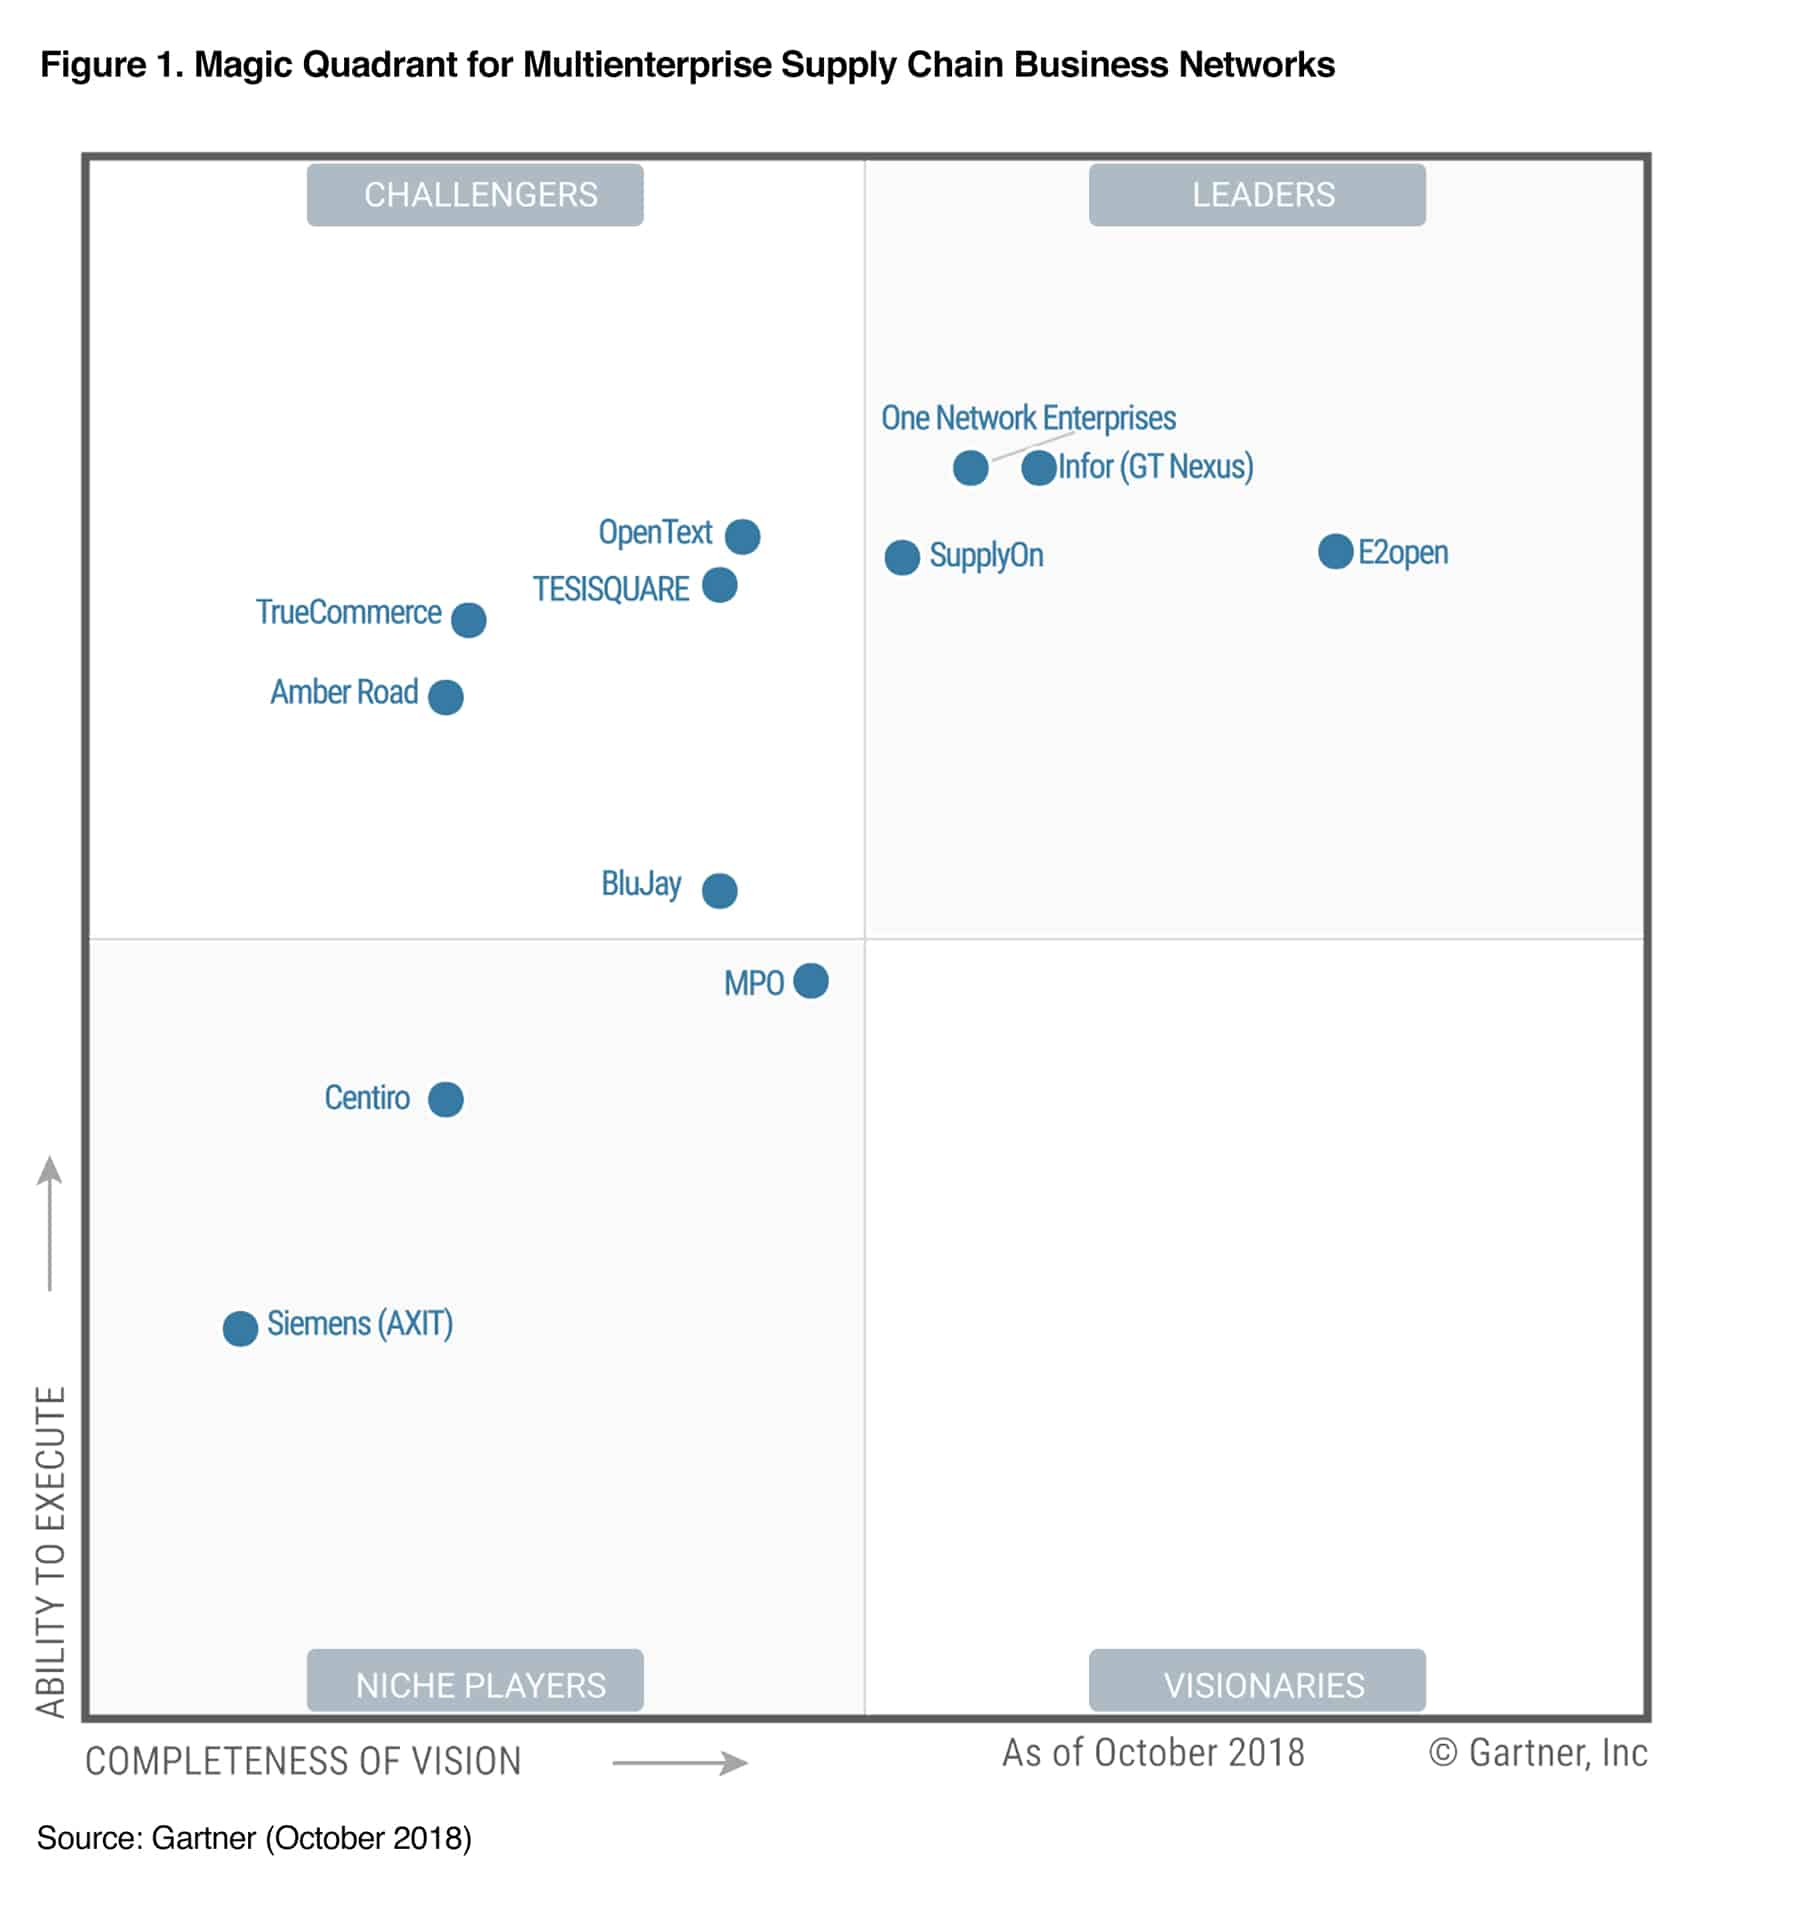 Gartner 2018 Magic Quadrant for Multienterprise Supply Chain